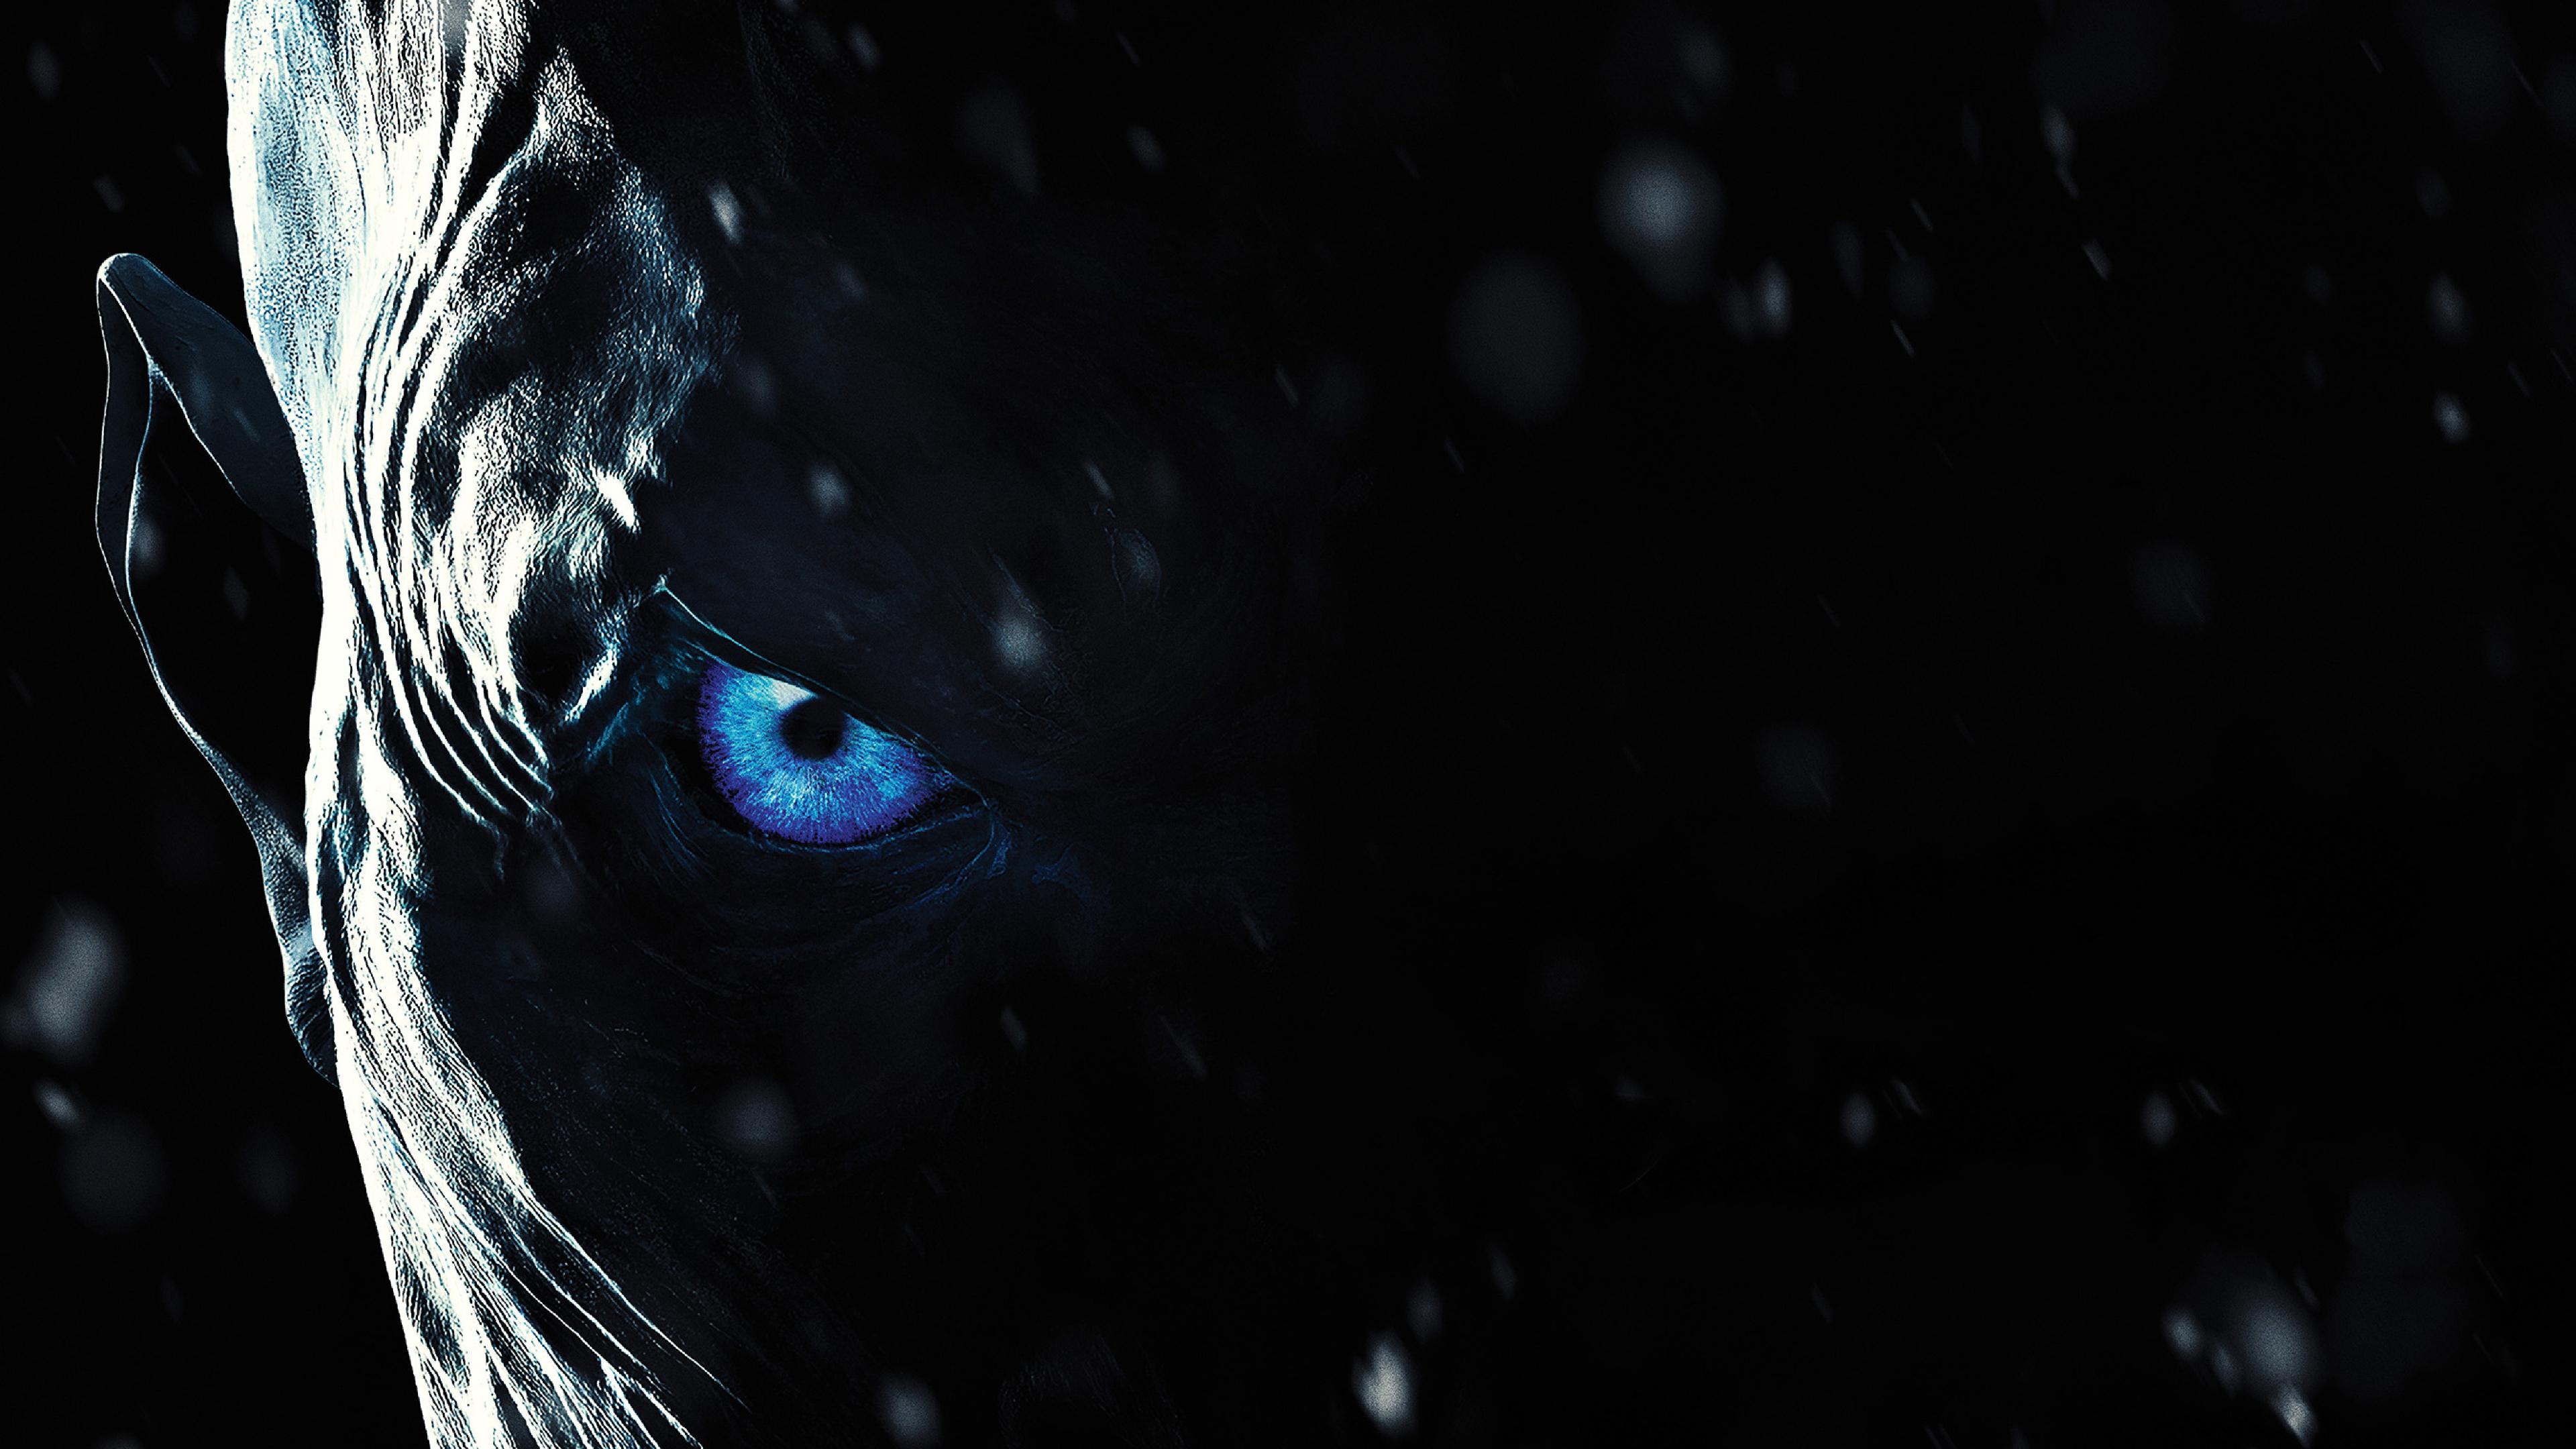 Game of Thrones Season 7 White Walkers TV Show 4K Wallpaper   Best 3840x2160